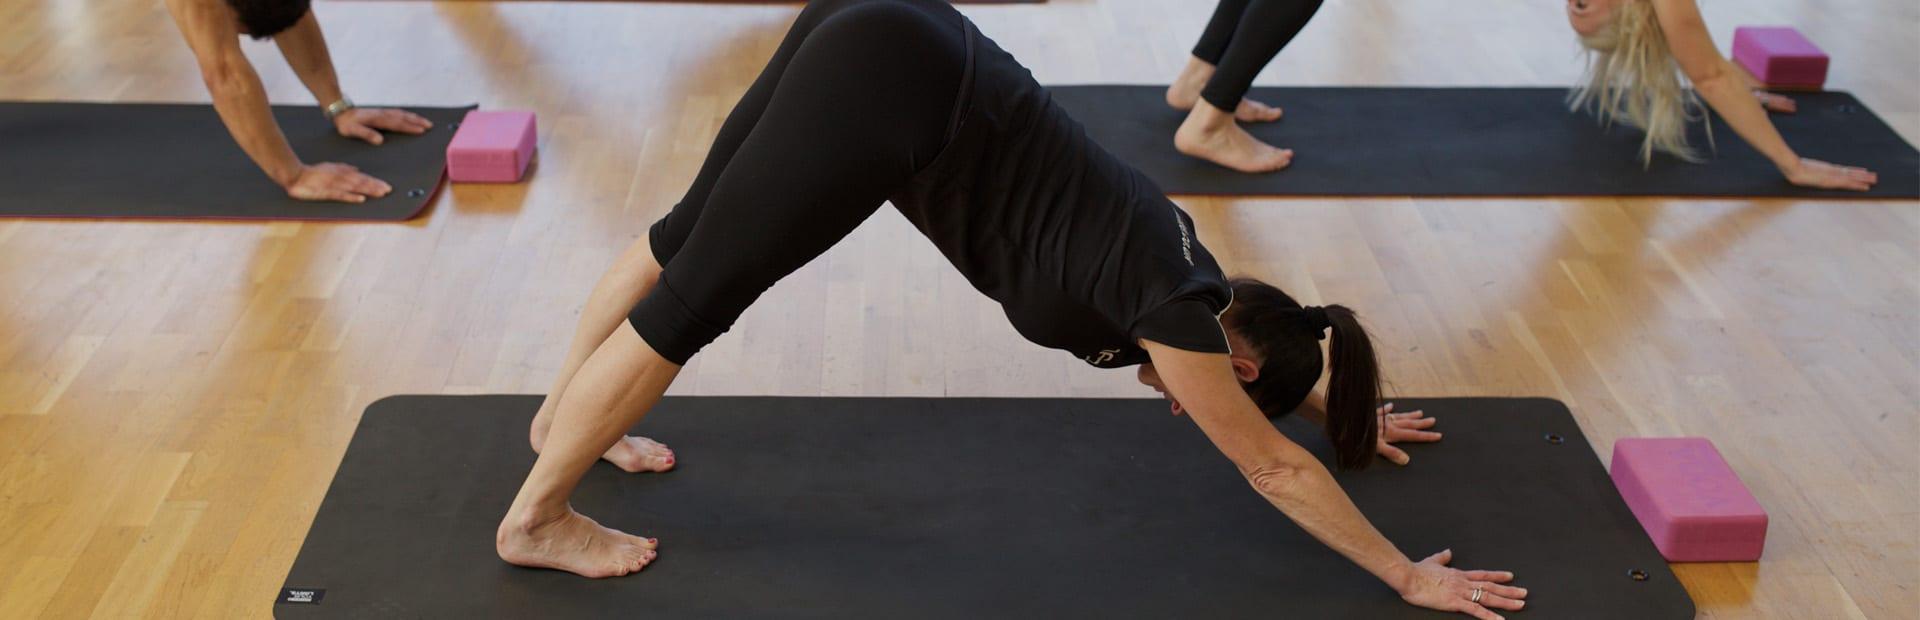 HFE yoga instructor performing downward-facing dog